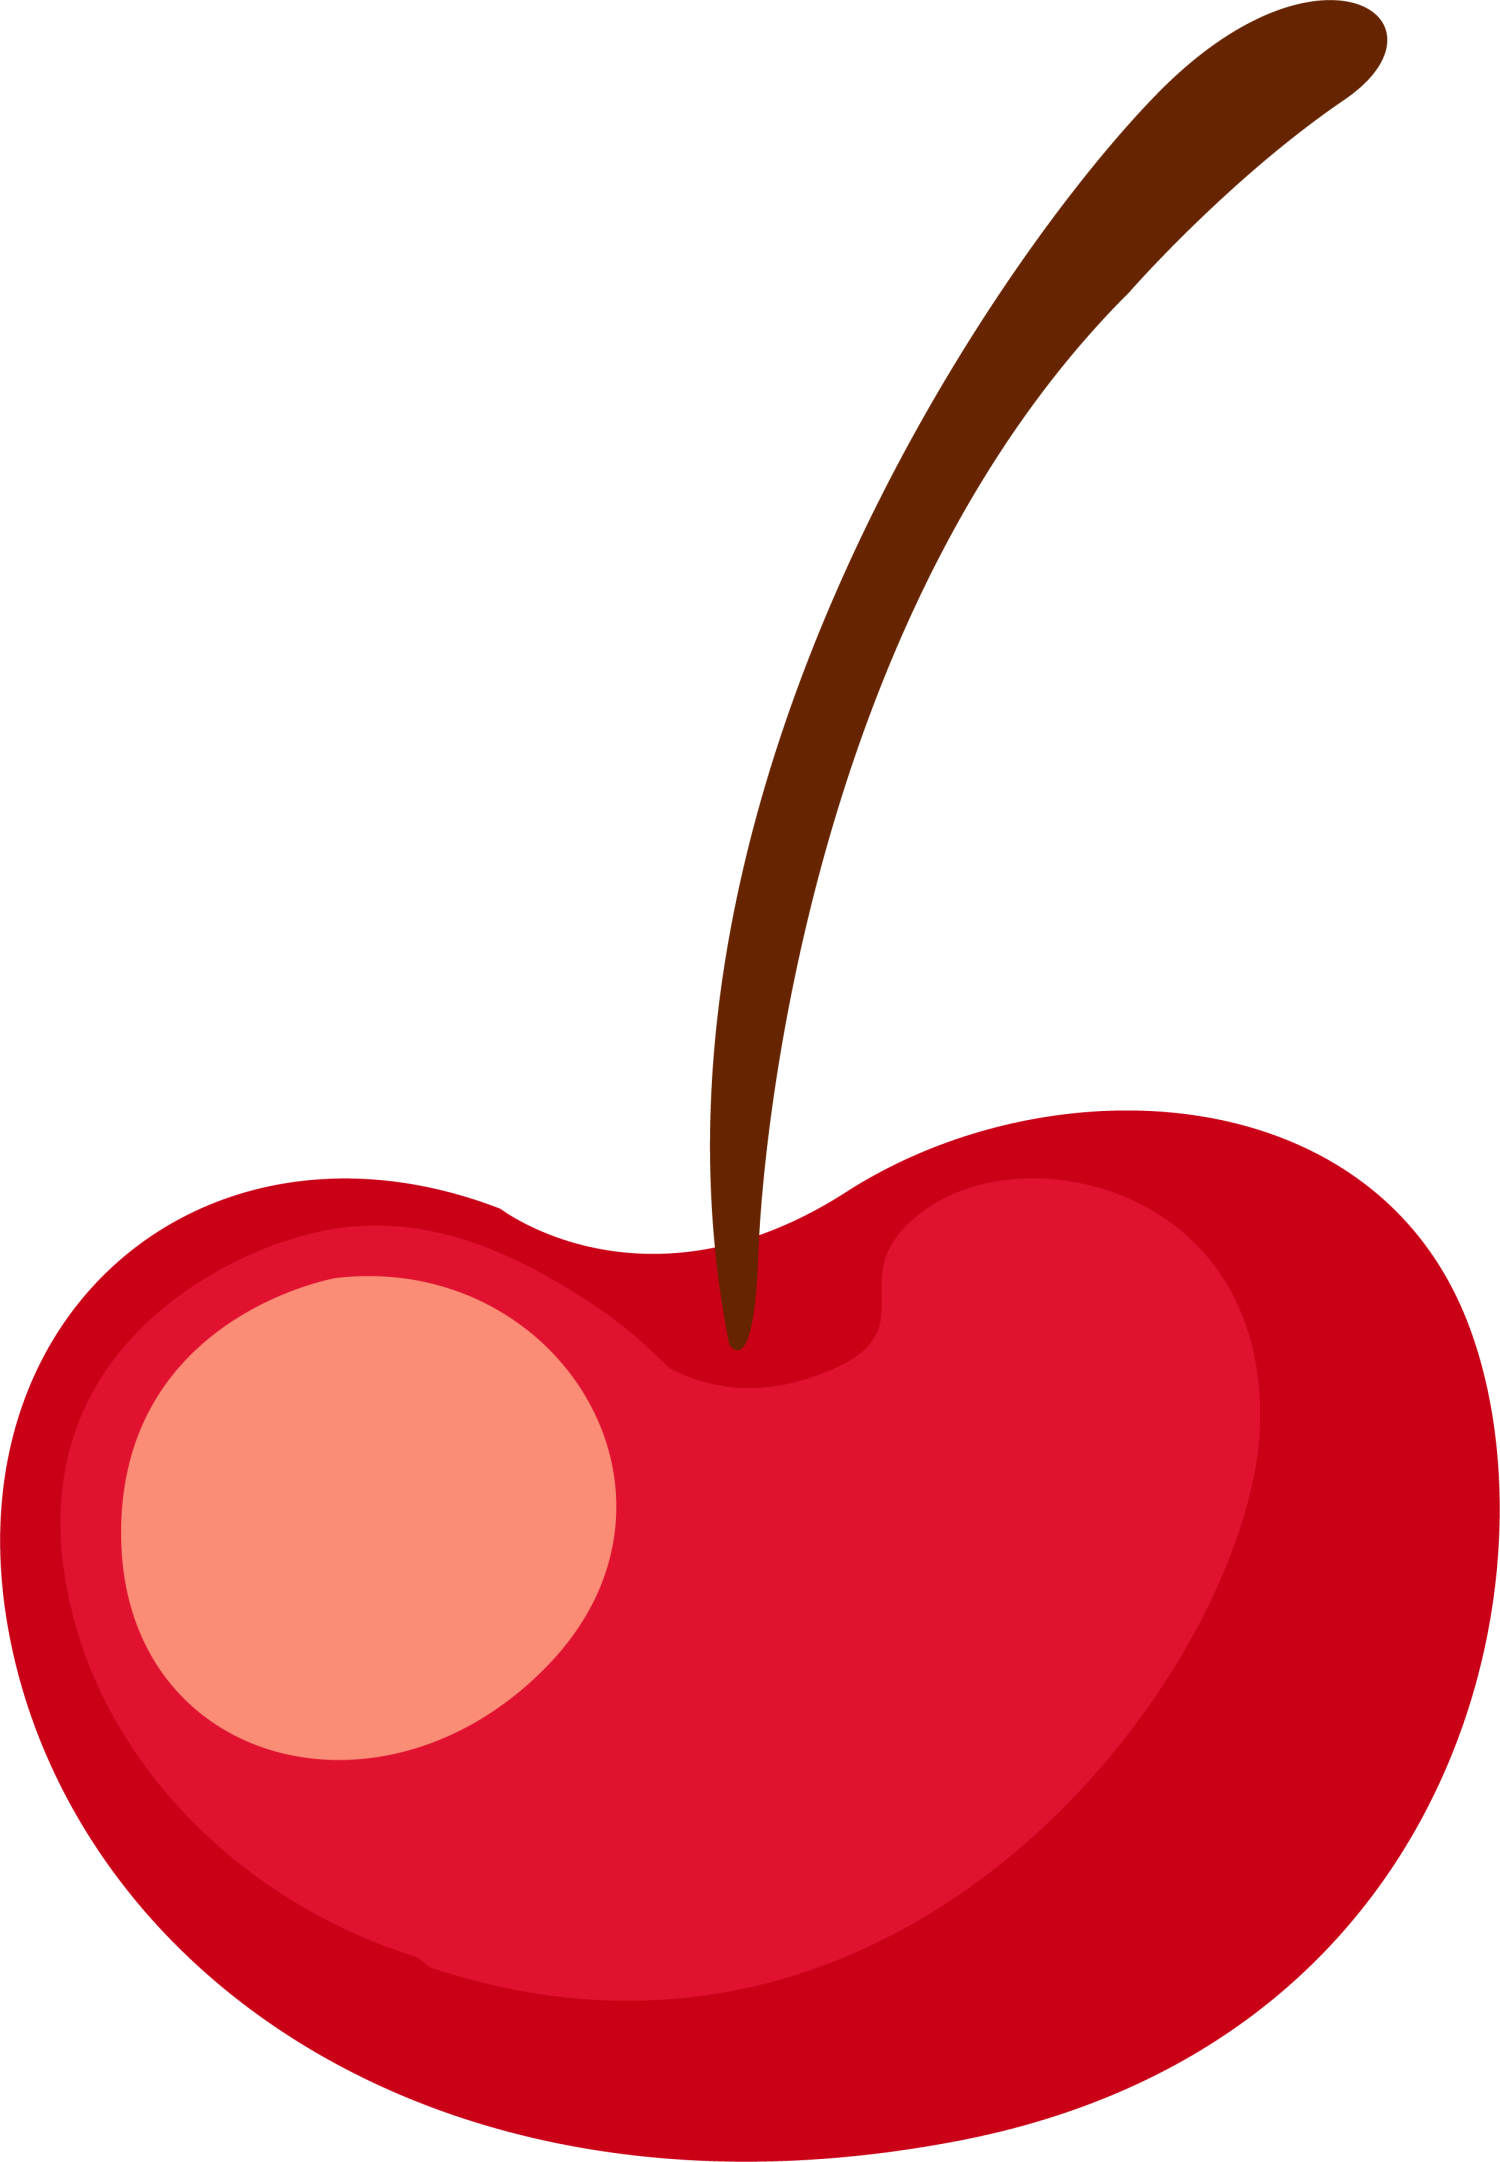 Mango clipart cherry. Fruit cartoon clip art